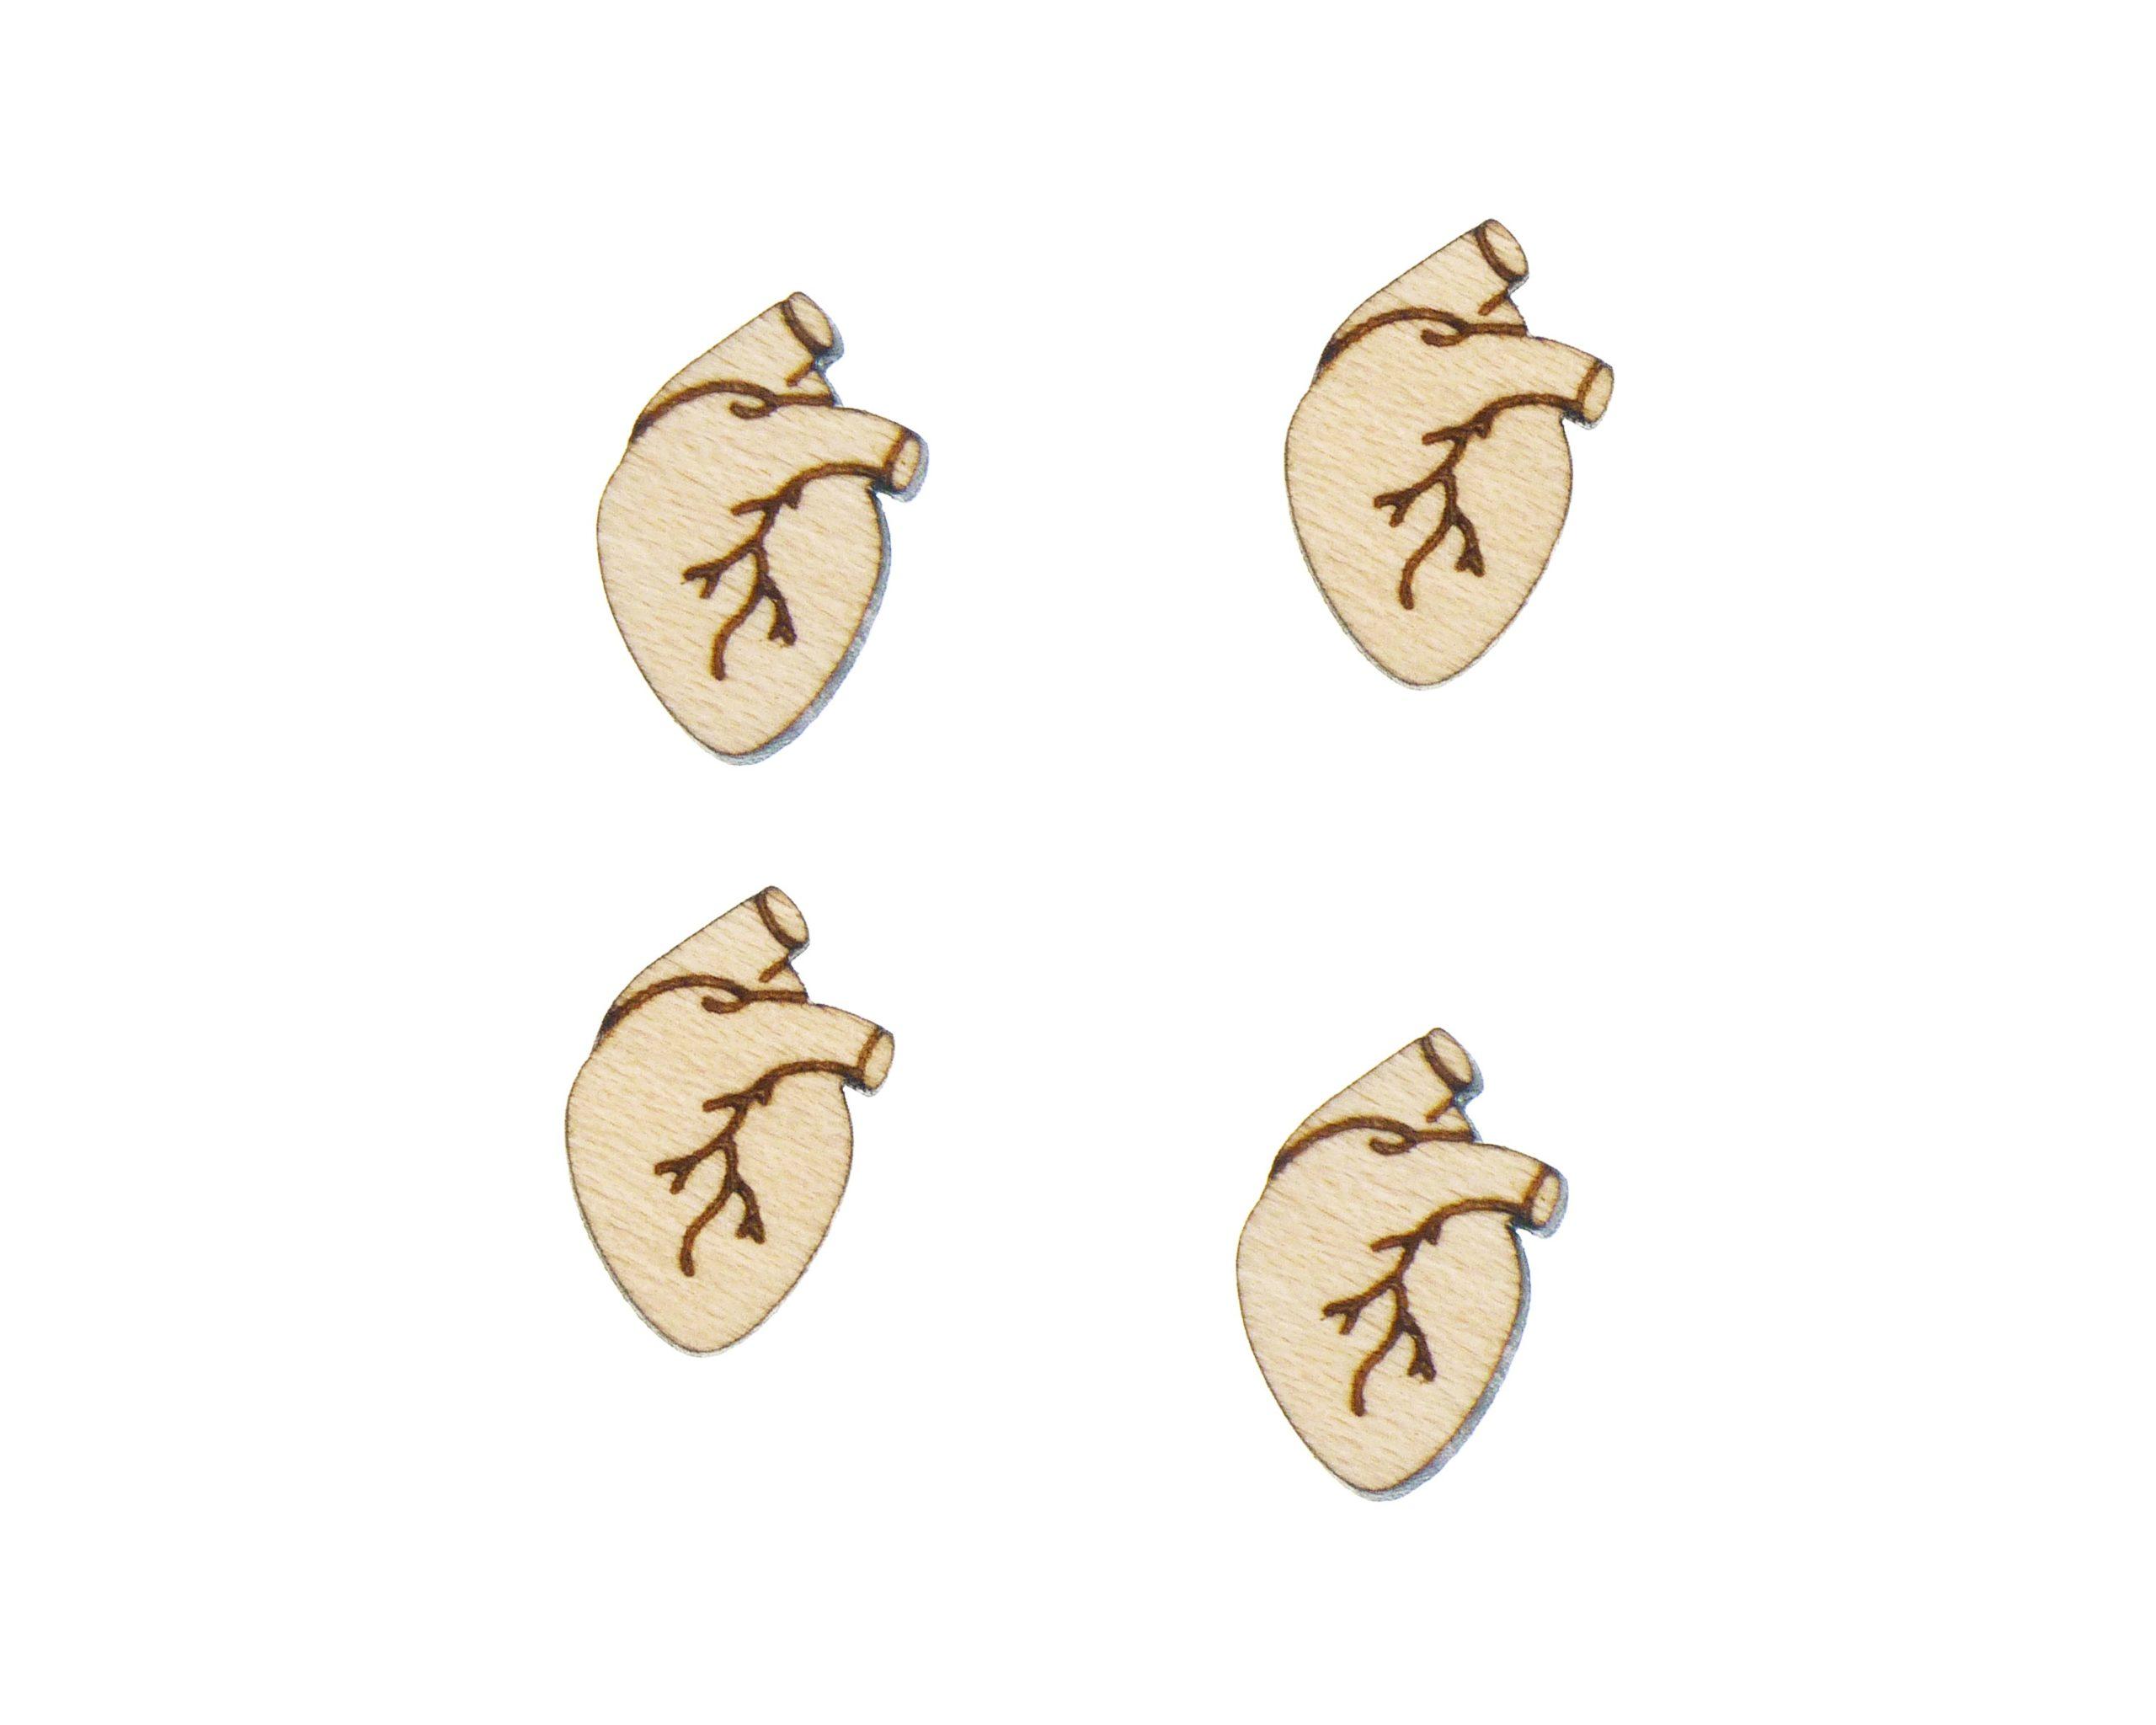 Anatomical Hearts Engraved Wood Cabochons